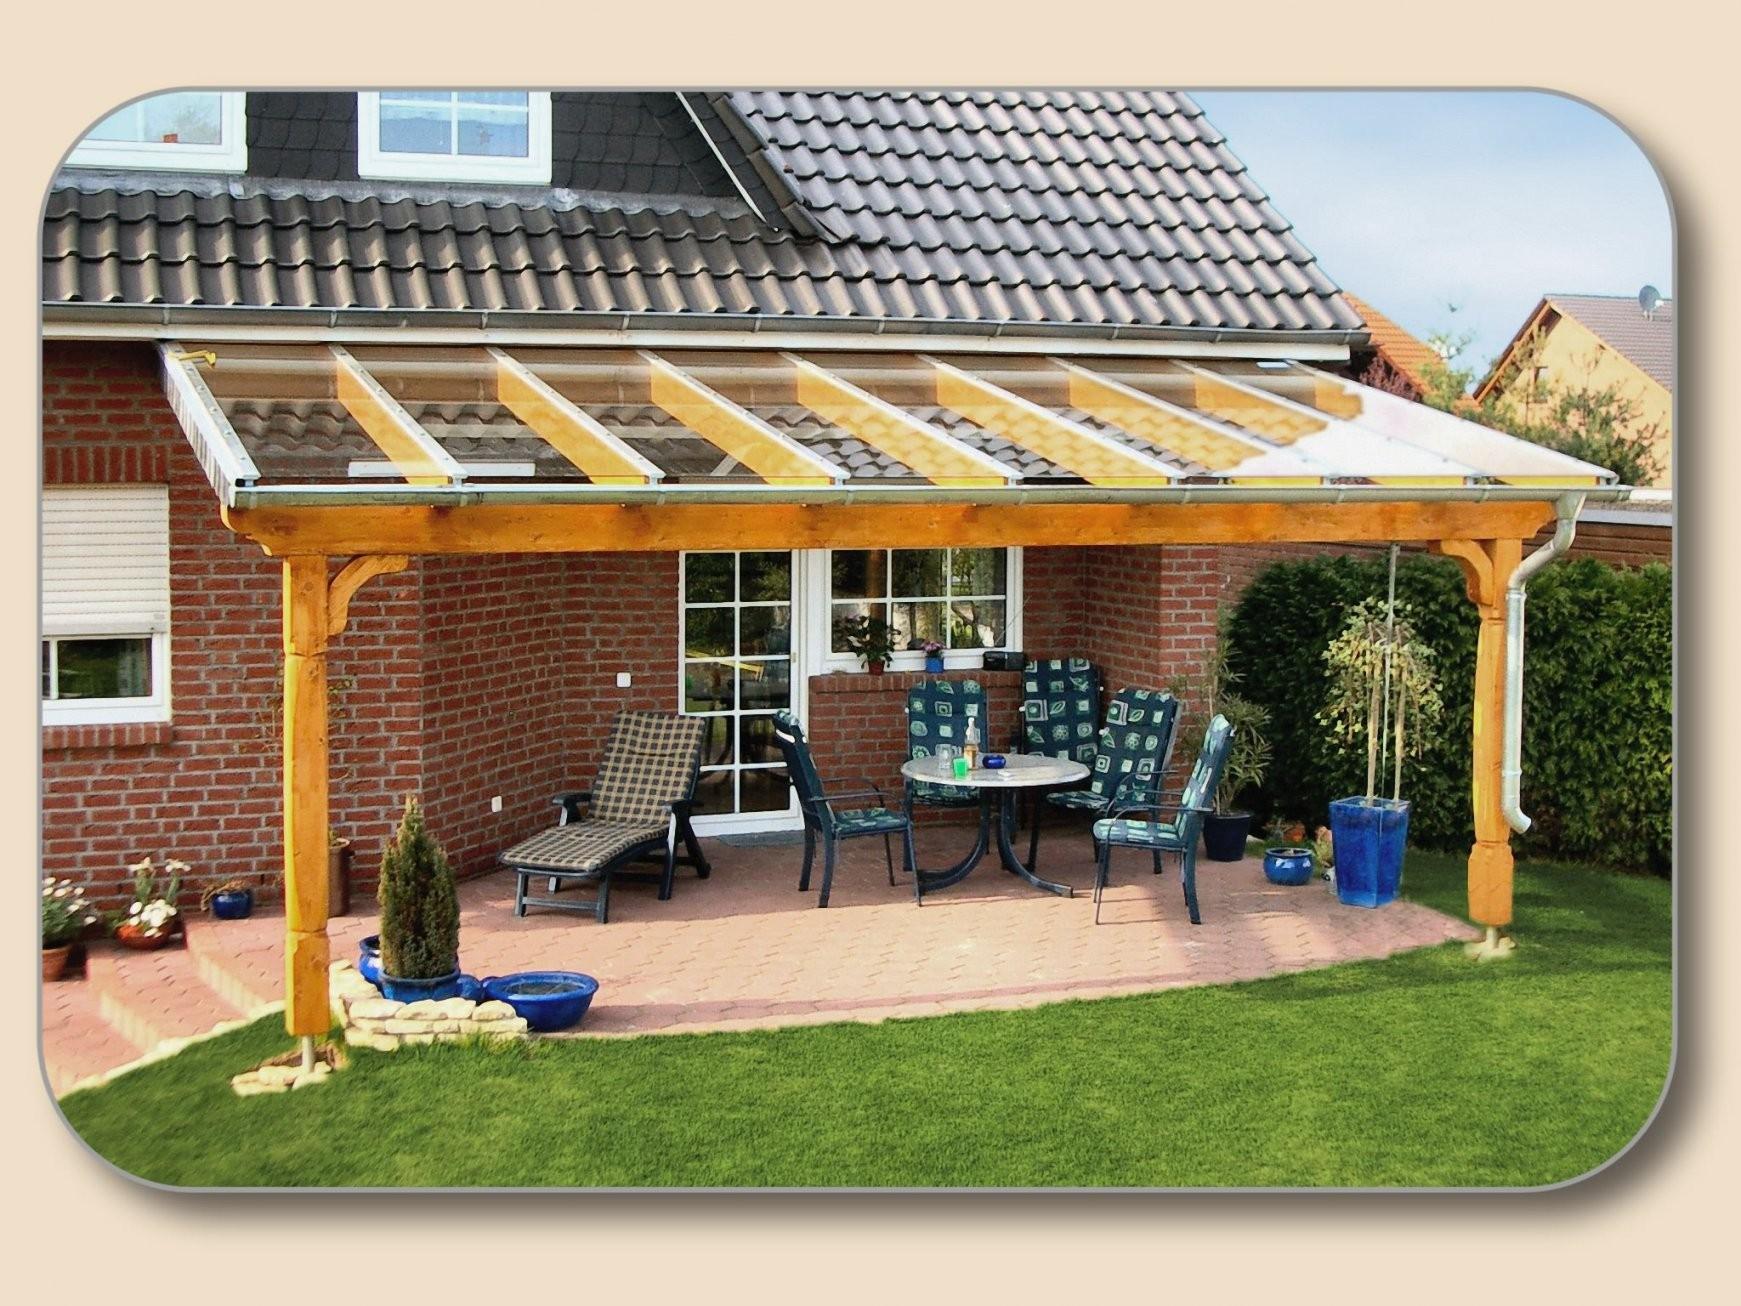 Carport Terrassenüberdachung Gartensauna Pavillon Holz Glas von Terrassenüberdachung Freistehend Holz Selber Bauen Bild